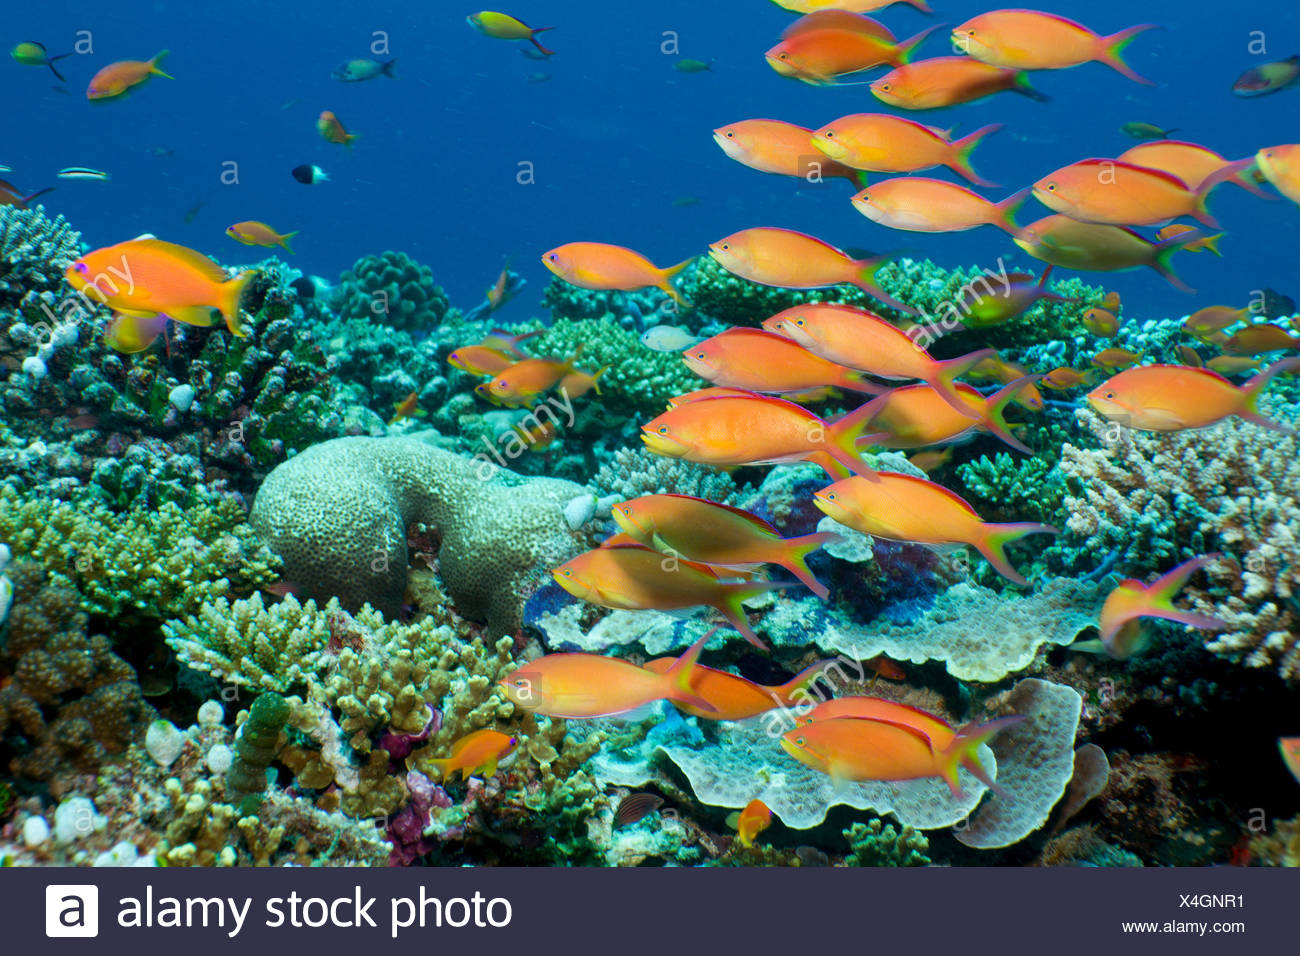 Schooling anthias, Maldives - Stock Image